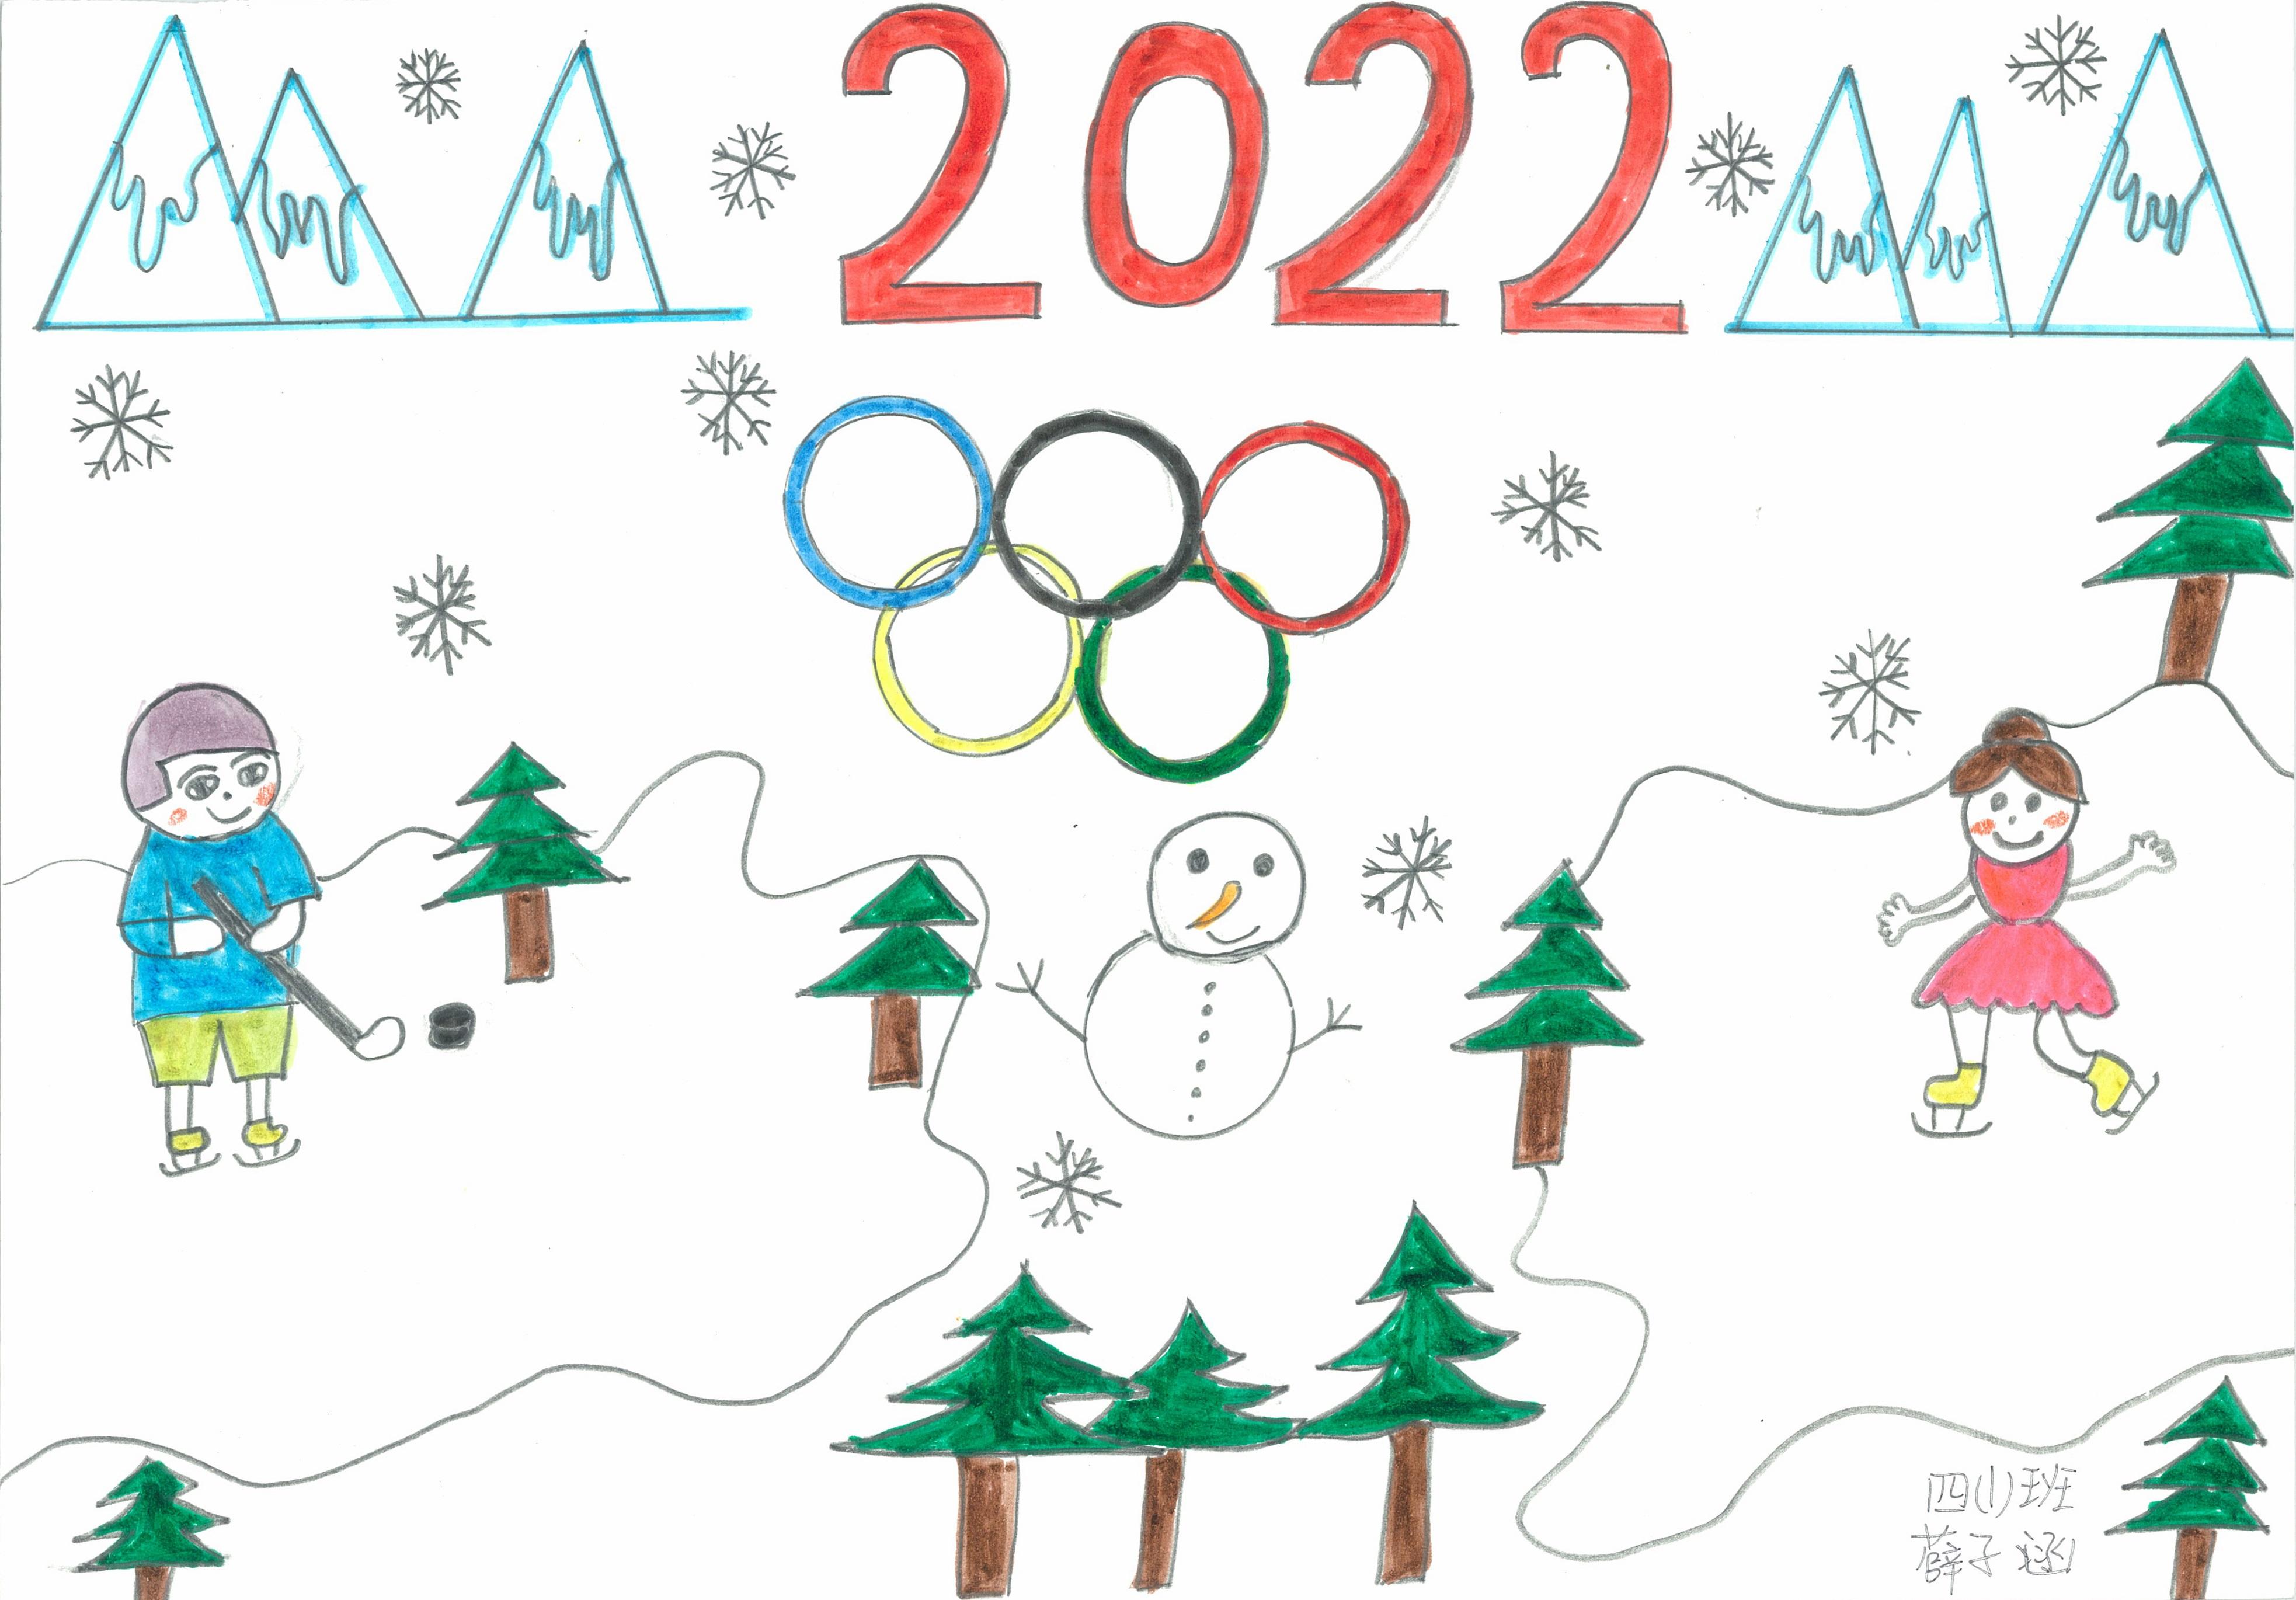 《我心中的冬奥荣耀时刻》Glory Moments Of The Winter Olympics In My Heart +薛子涵 Xue Zihan